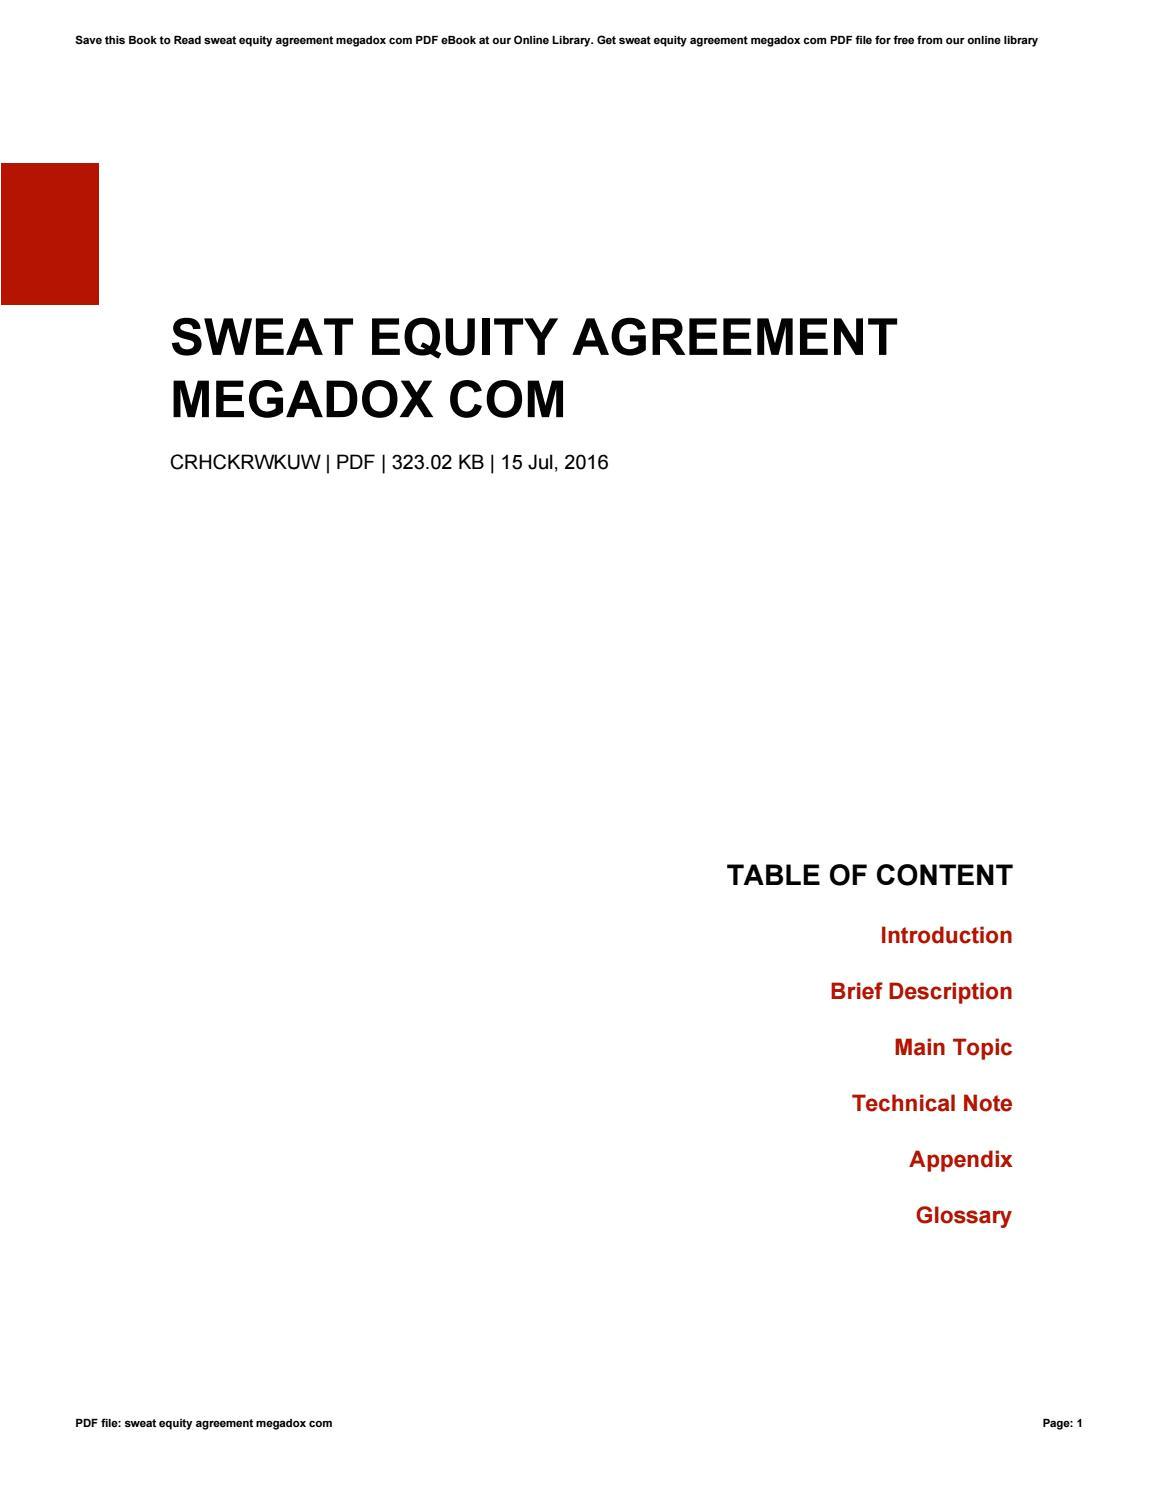 sweat equity agreement megadox com